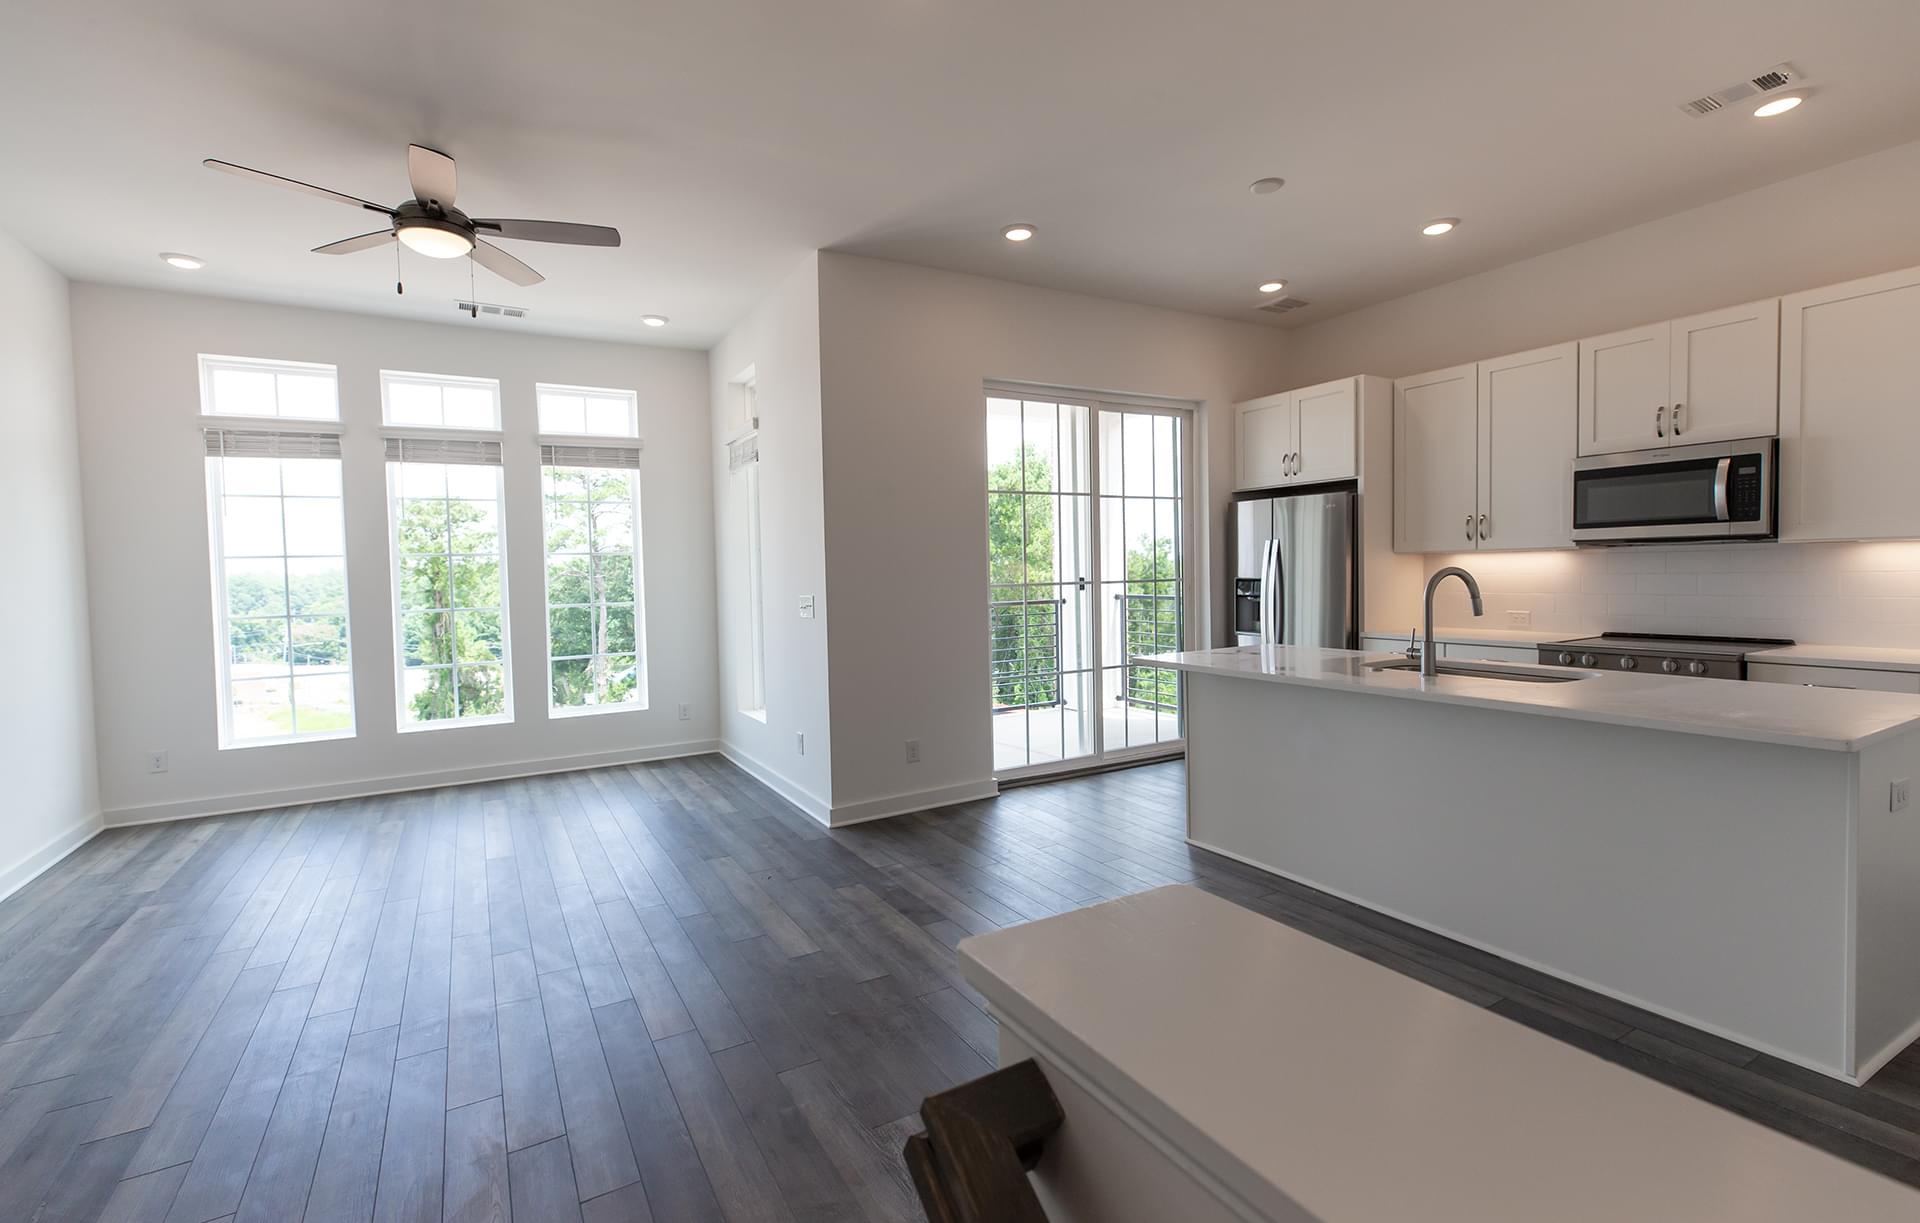 The Edgehill New Home in Alpharetta GA